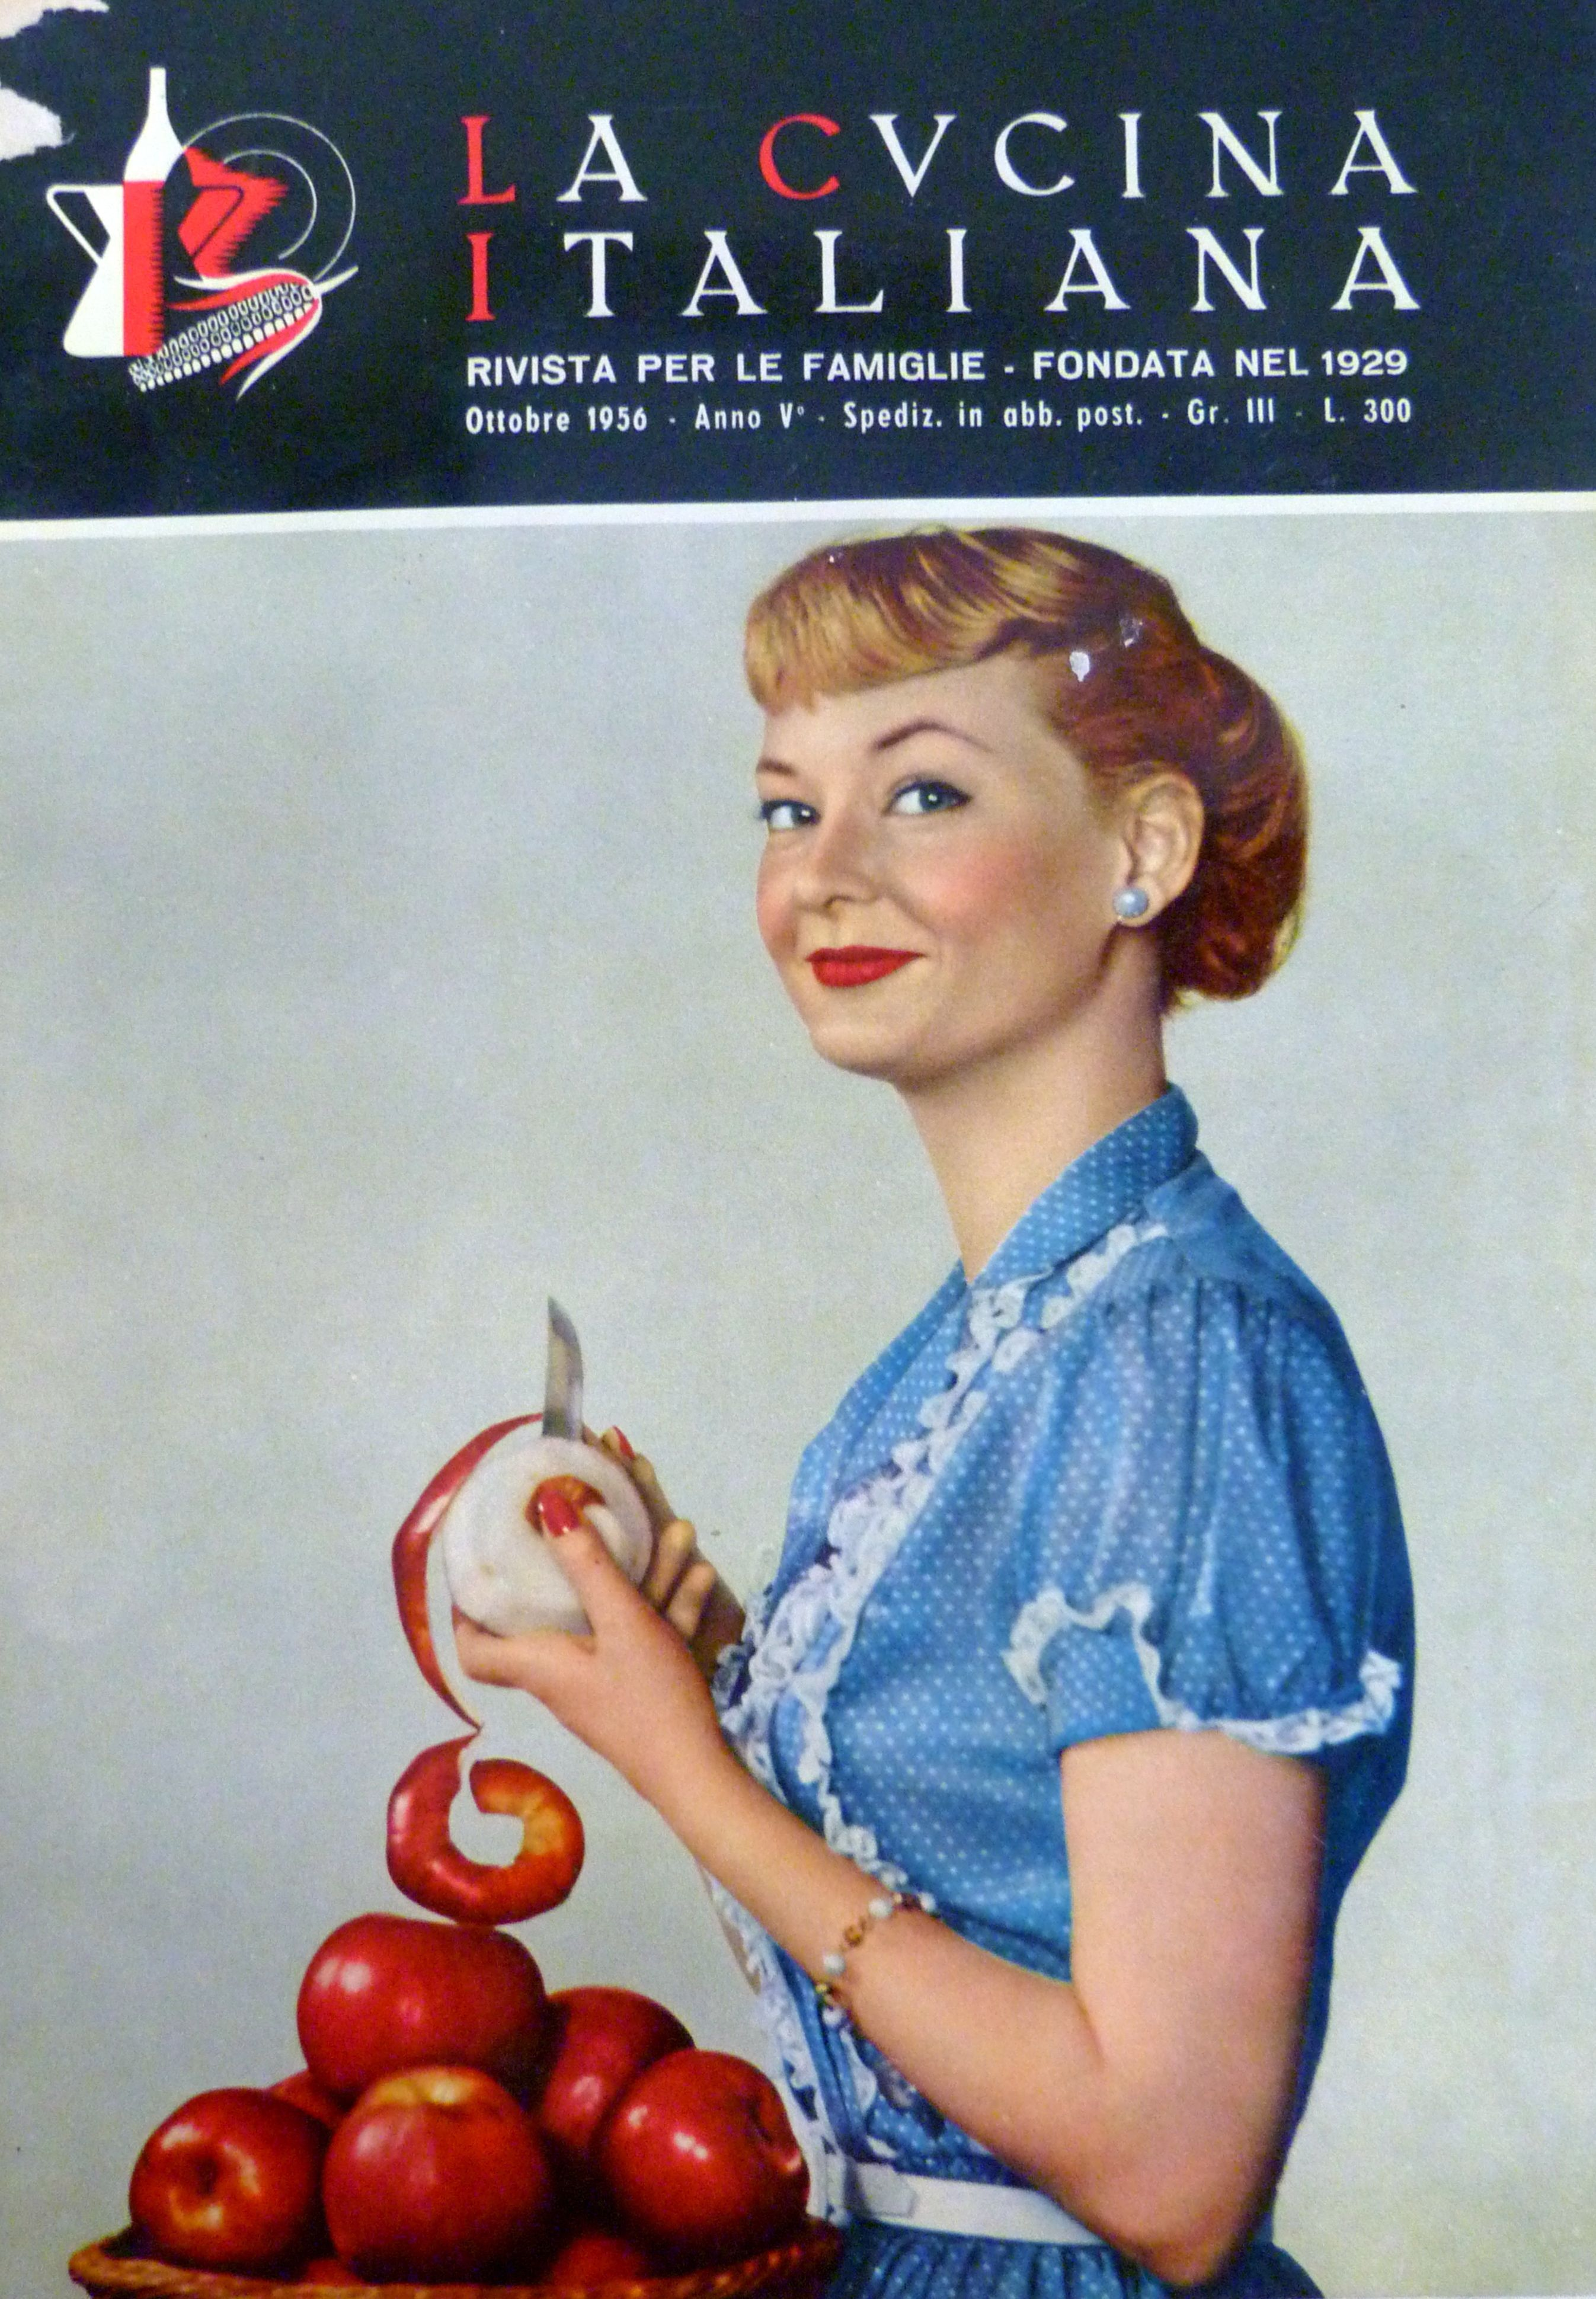 Ottobre 1956 cooking entertainment recipe cucina cucina italiana La cucina  Appletree Cottage